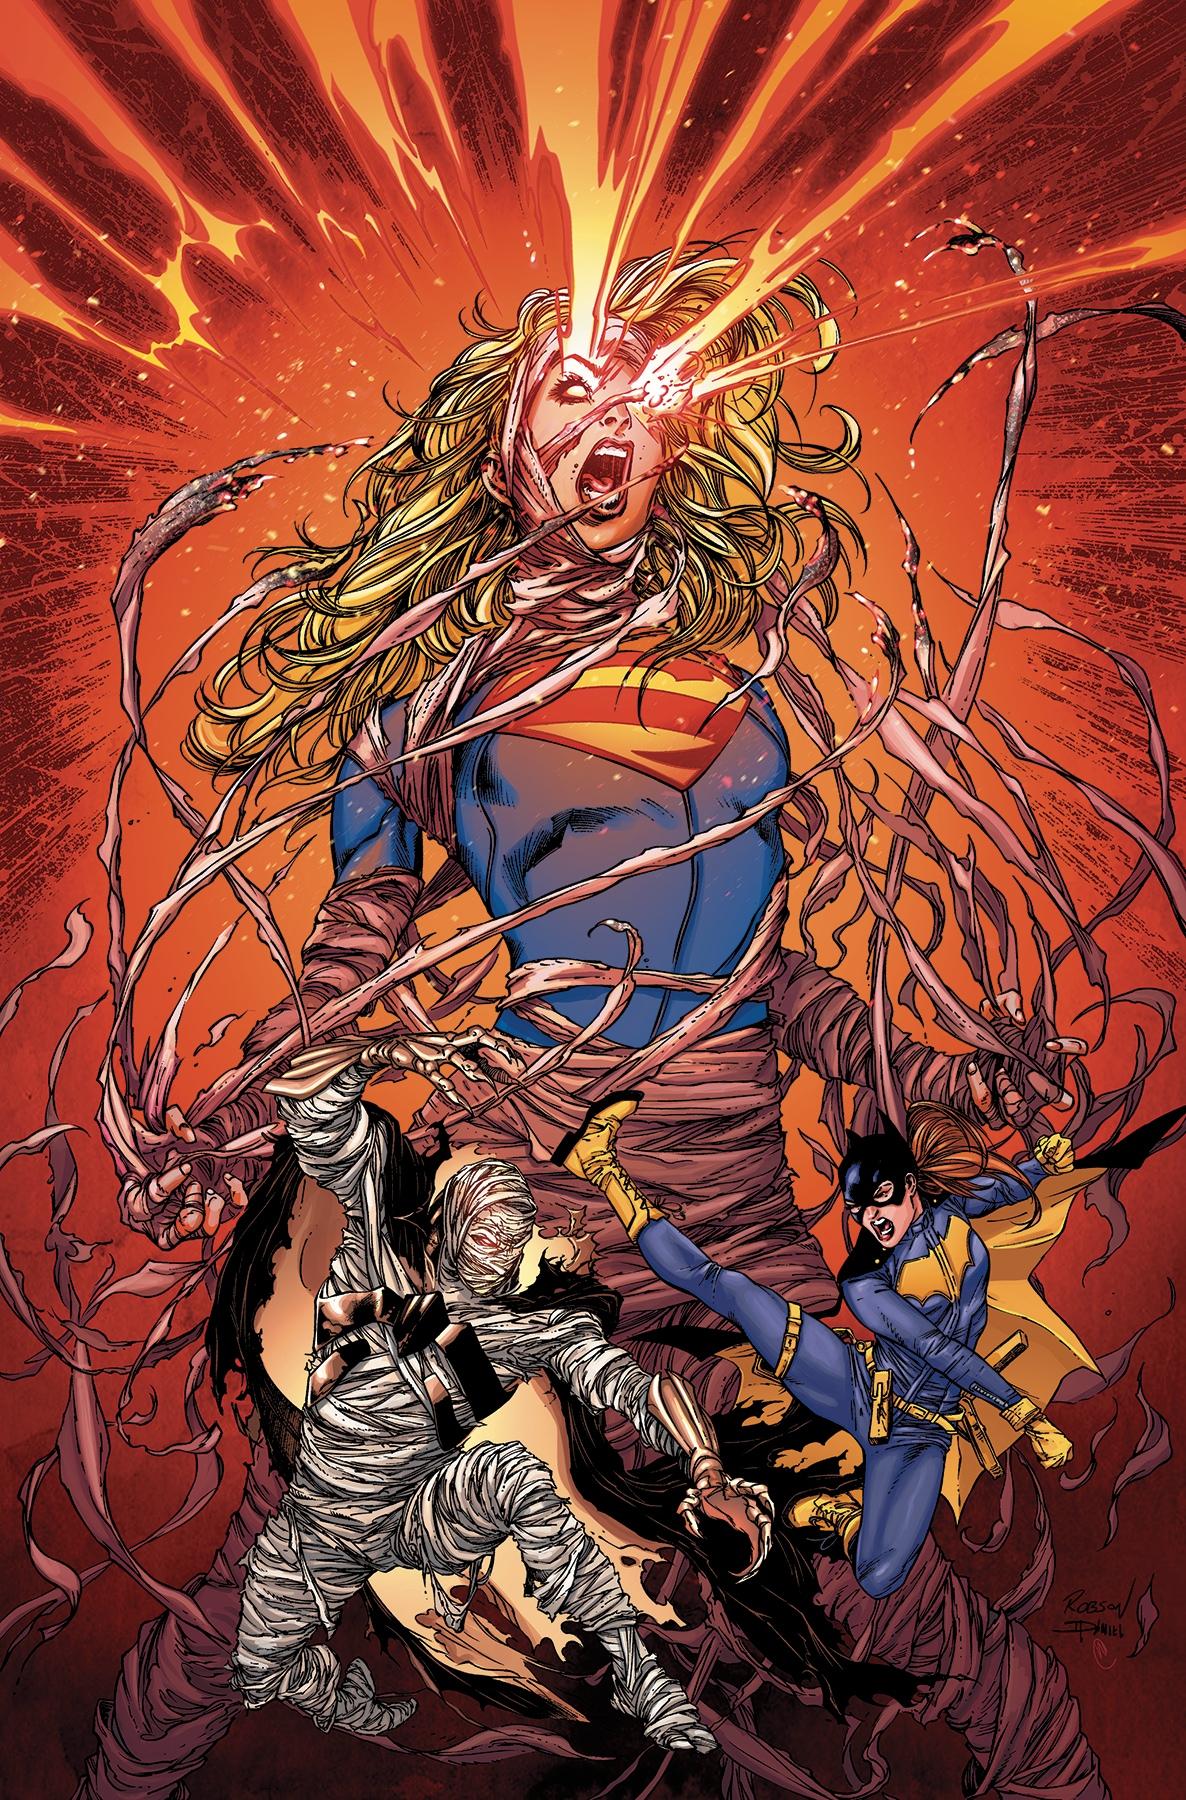 Supergirl Vol 7 11 Textless.jpg